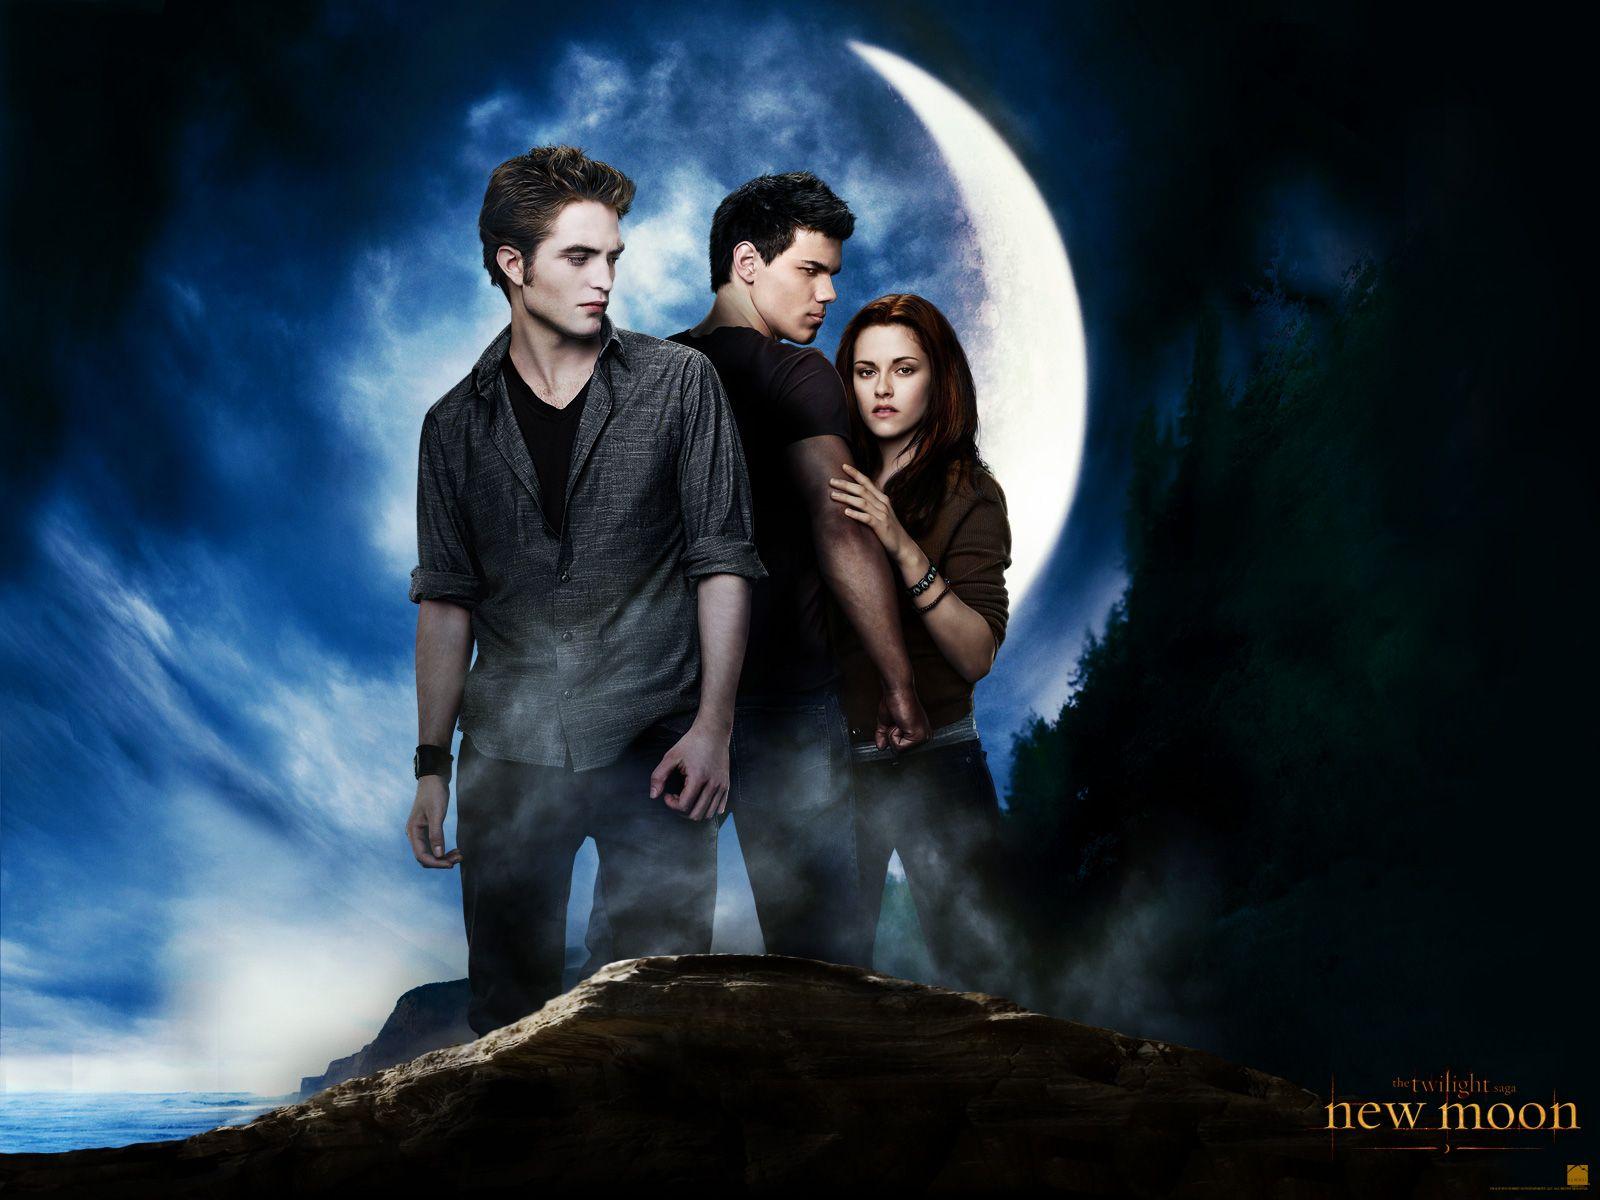 New Moon Movie Wallpaper New Moon Wallpaper Twilight Saga Twilight Saga New Moon Twilight New Moon